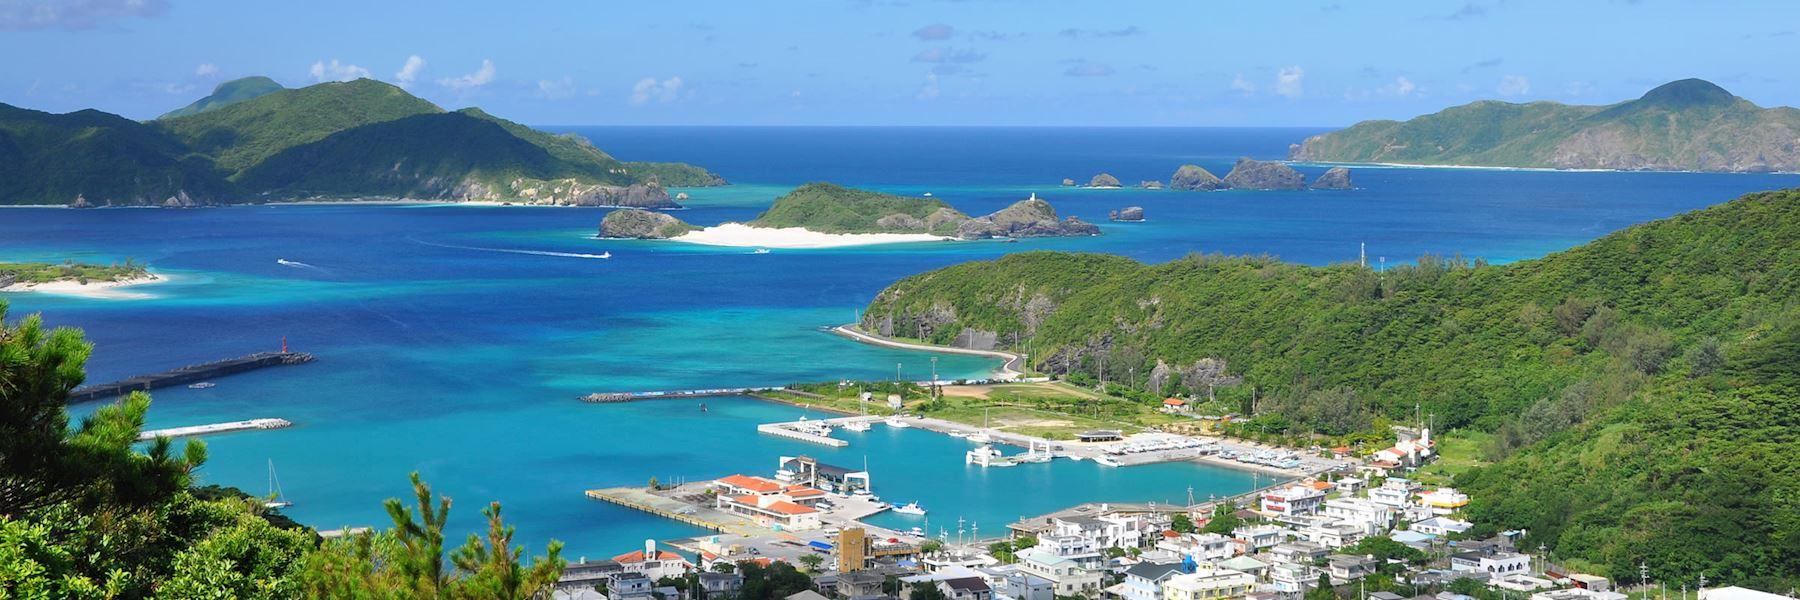 Visit Zamami Island, Japan